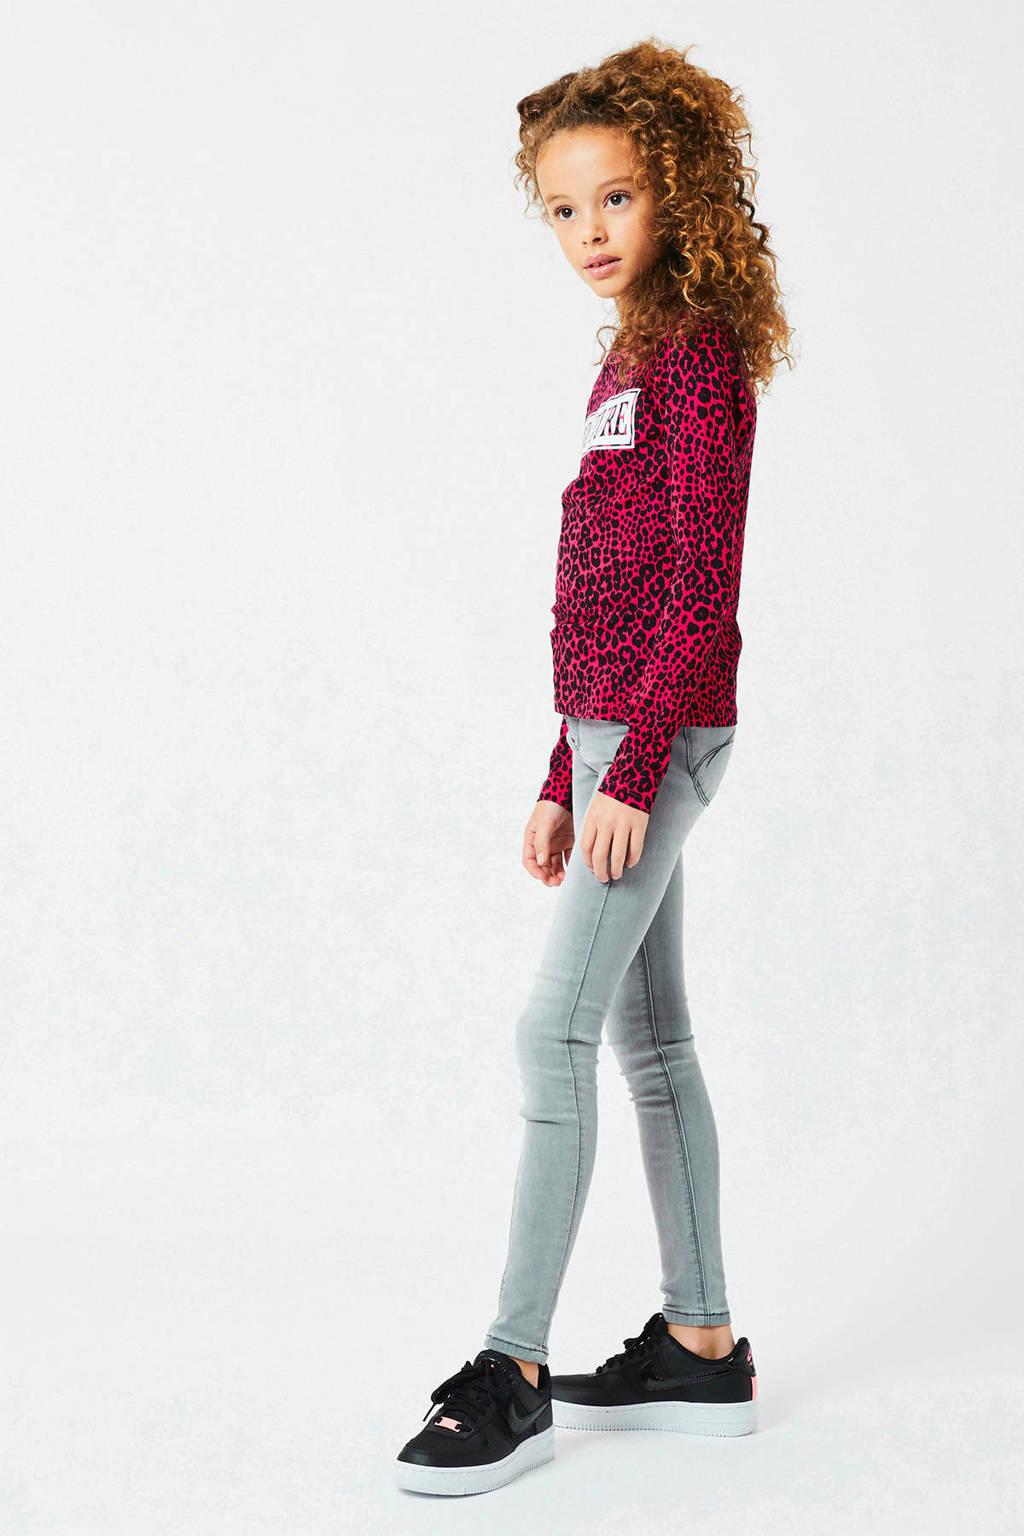 CoolCat Junior skinny jeans Kate lichtgrijs stonewashed, Lichtgrijs stonewashed